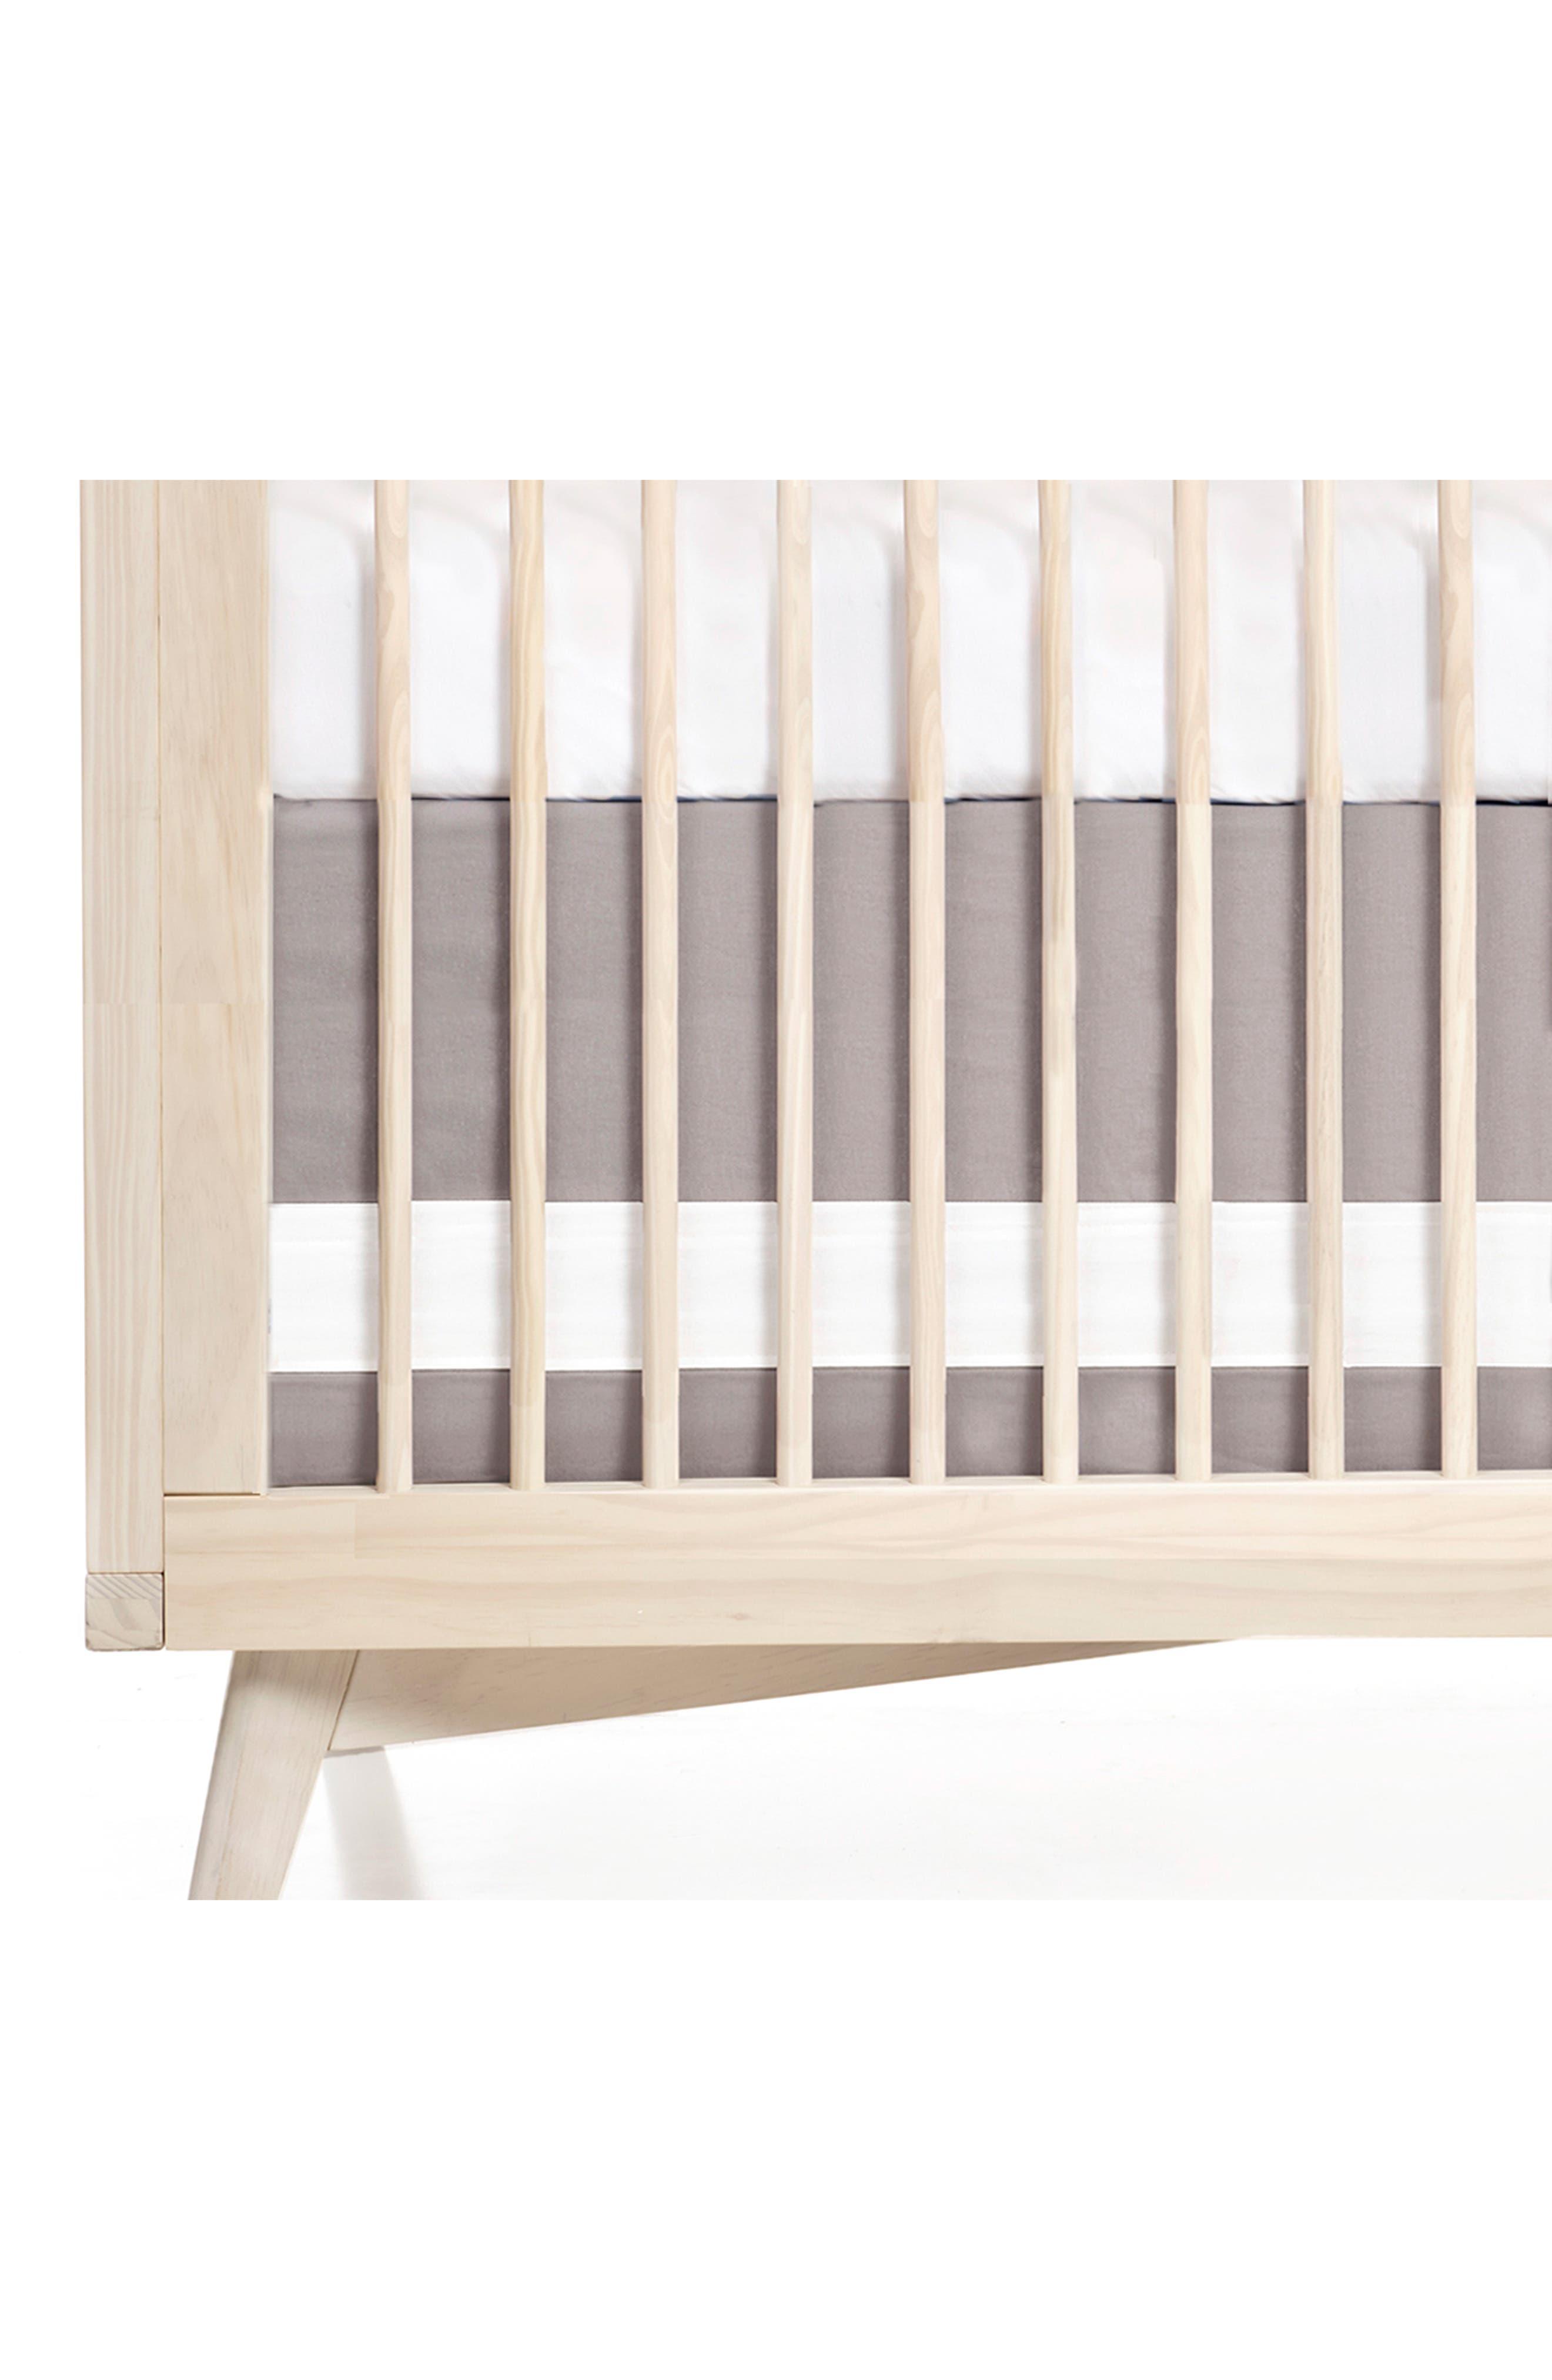 OILO, Llama Cuddle Blanket, Crib Skirt & Crib Sheet Set, Alternate thumbnail 5, color, LLAMA